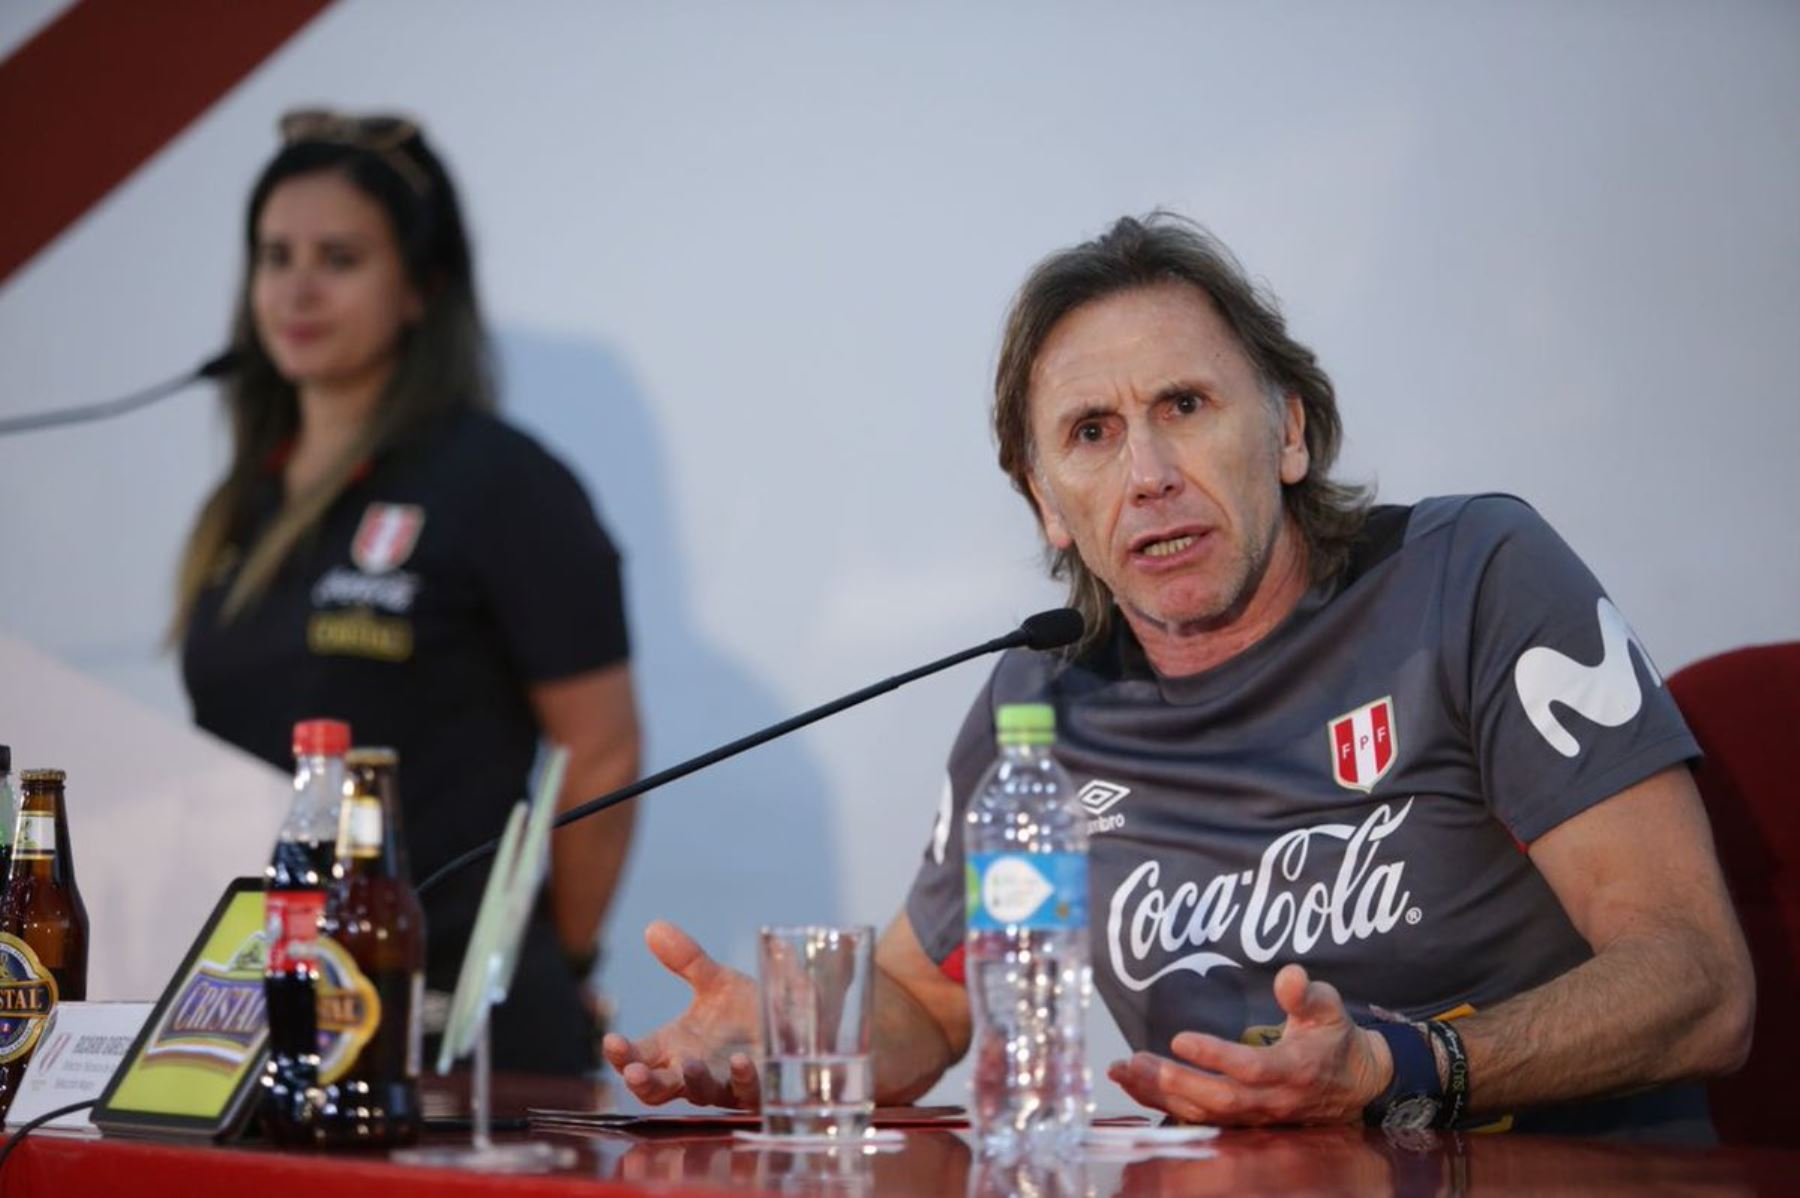 Miembro de FIFPro da una luz de esperanza al peruano — Paolo Guerrero